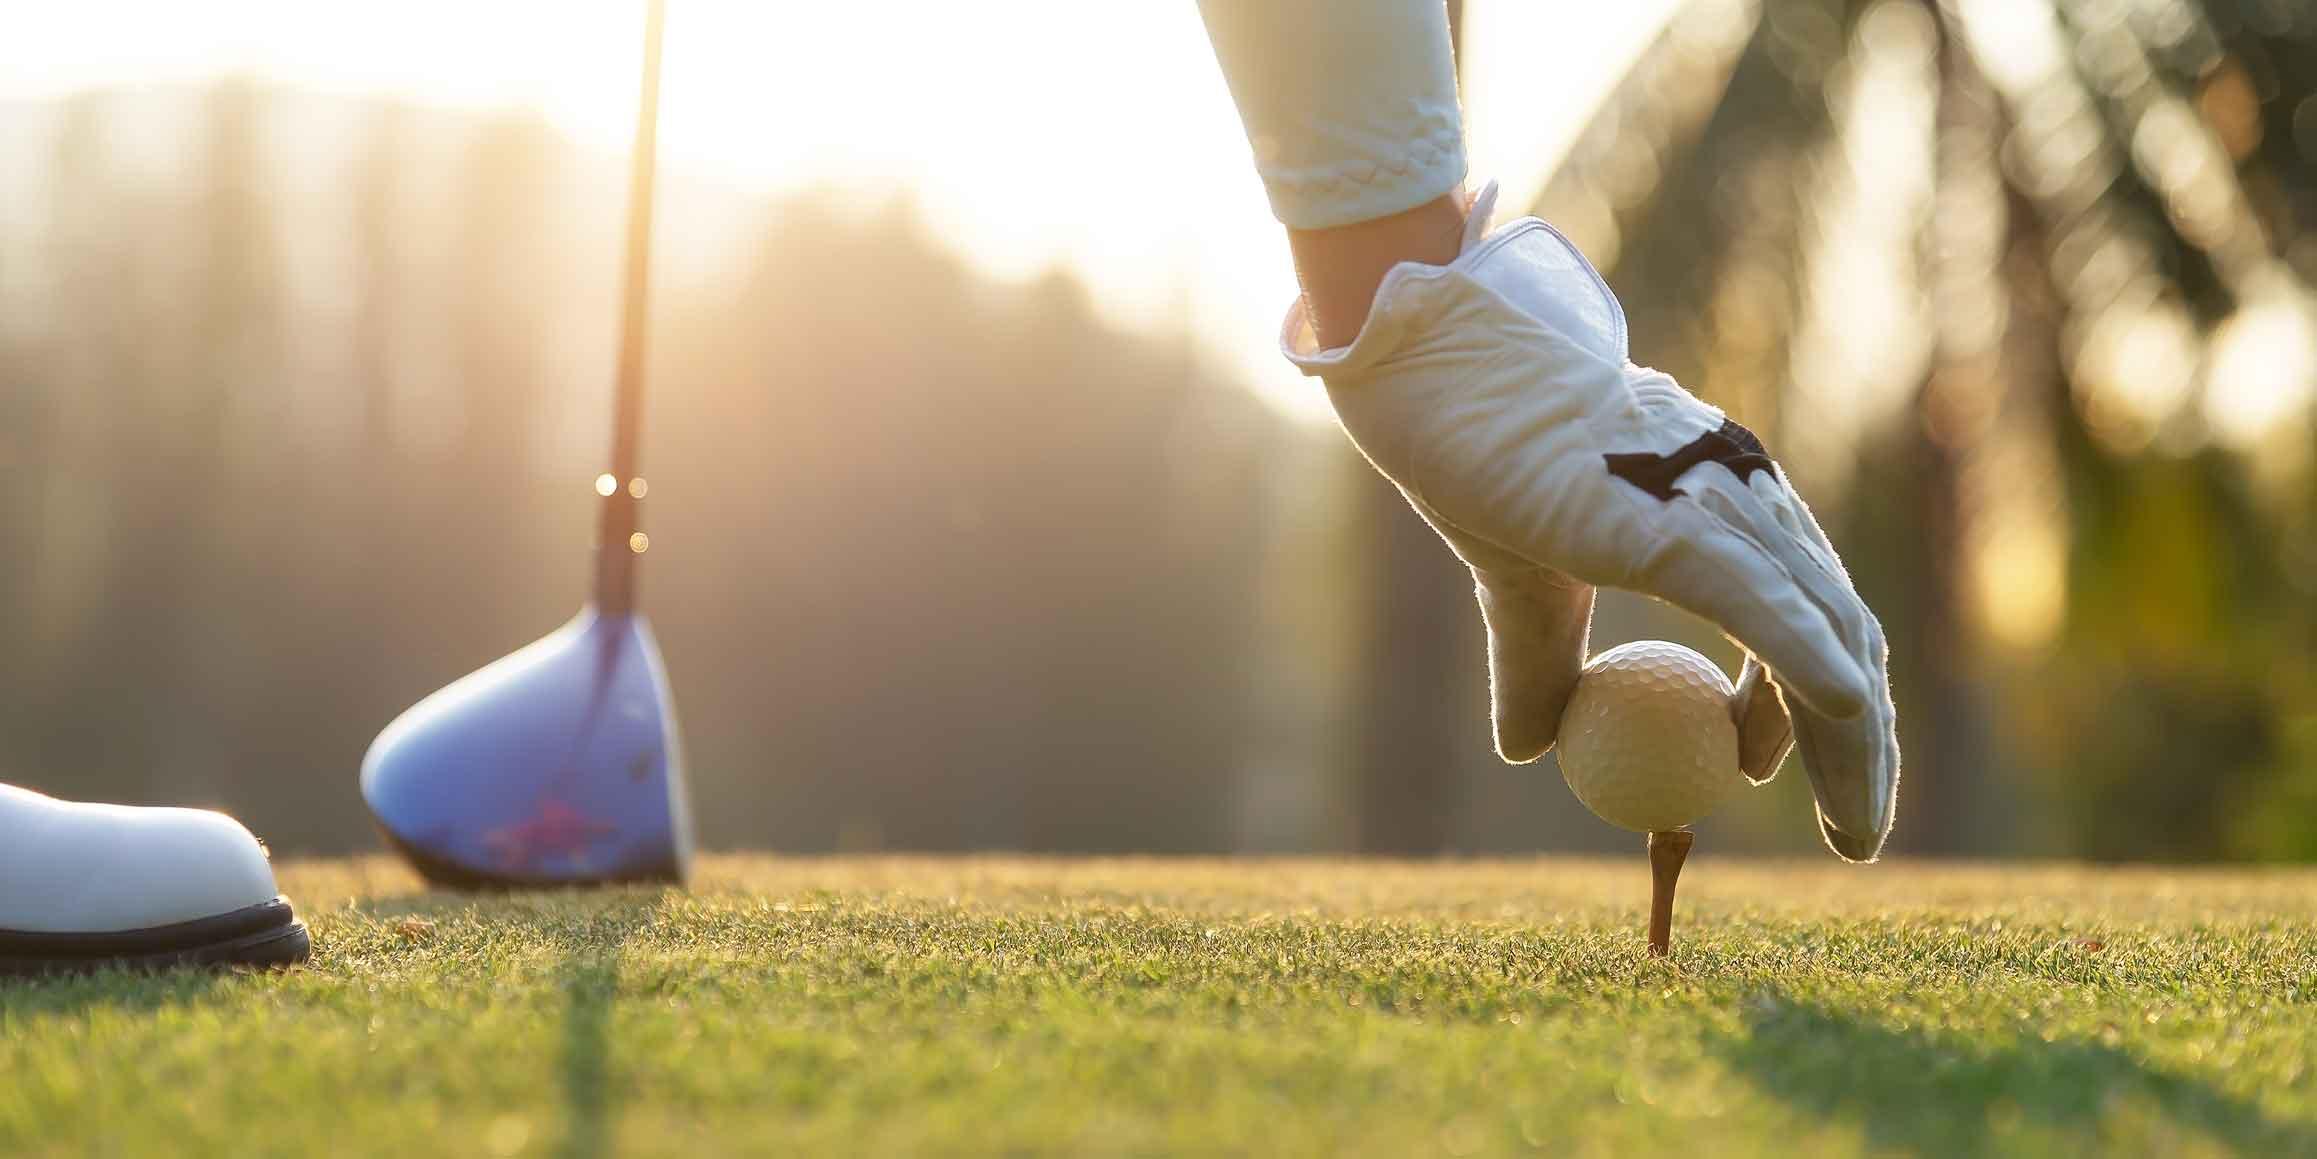 Golfer wearing white glove with golfing club in hand